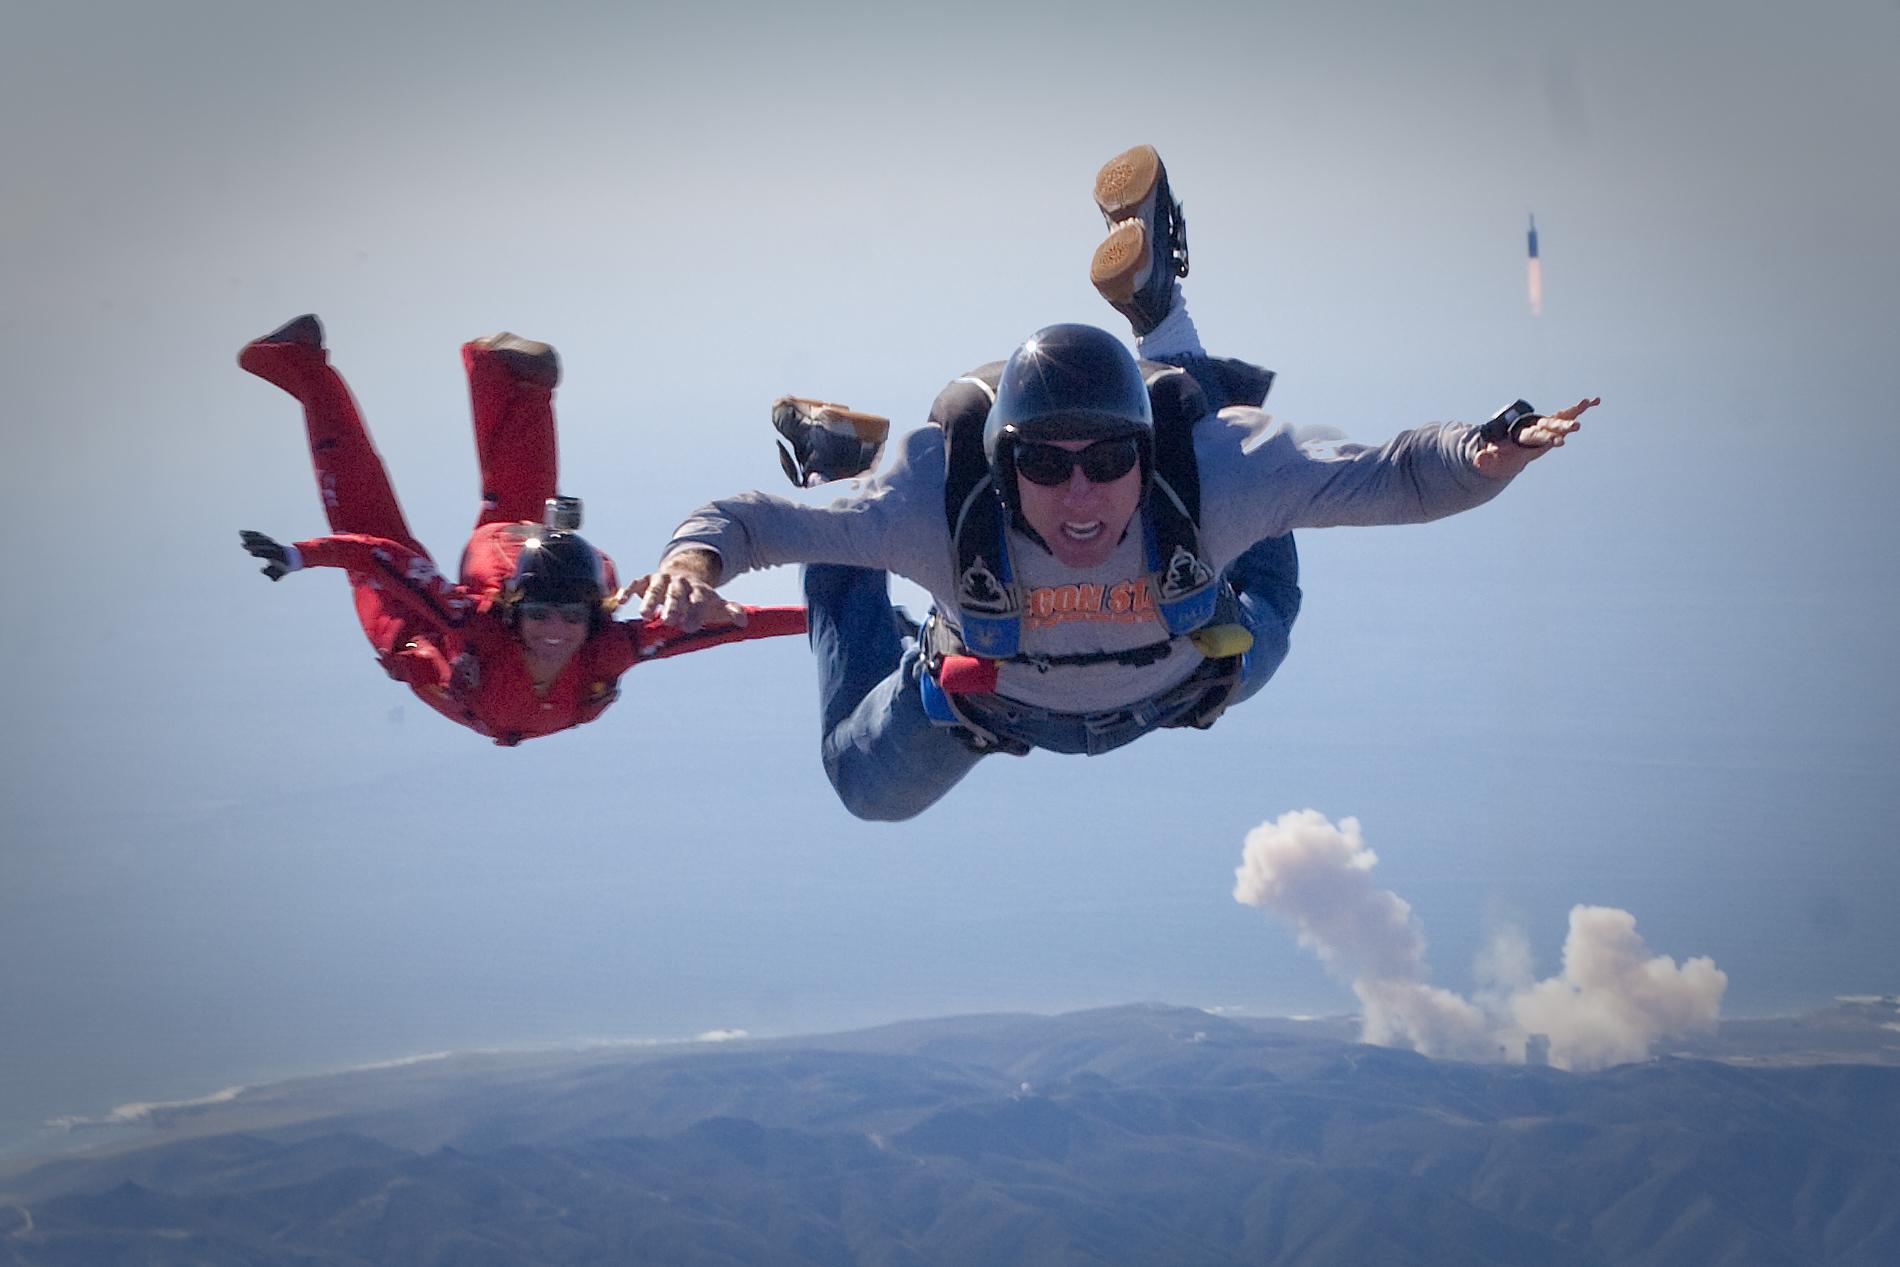 Sky Diving Solo Licensed Skydivers At Skydive Santa Barbara